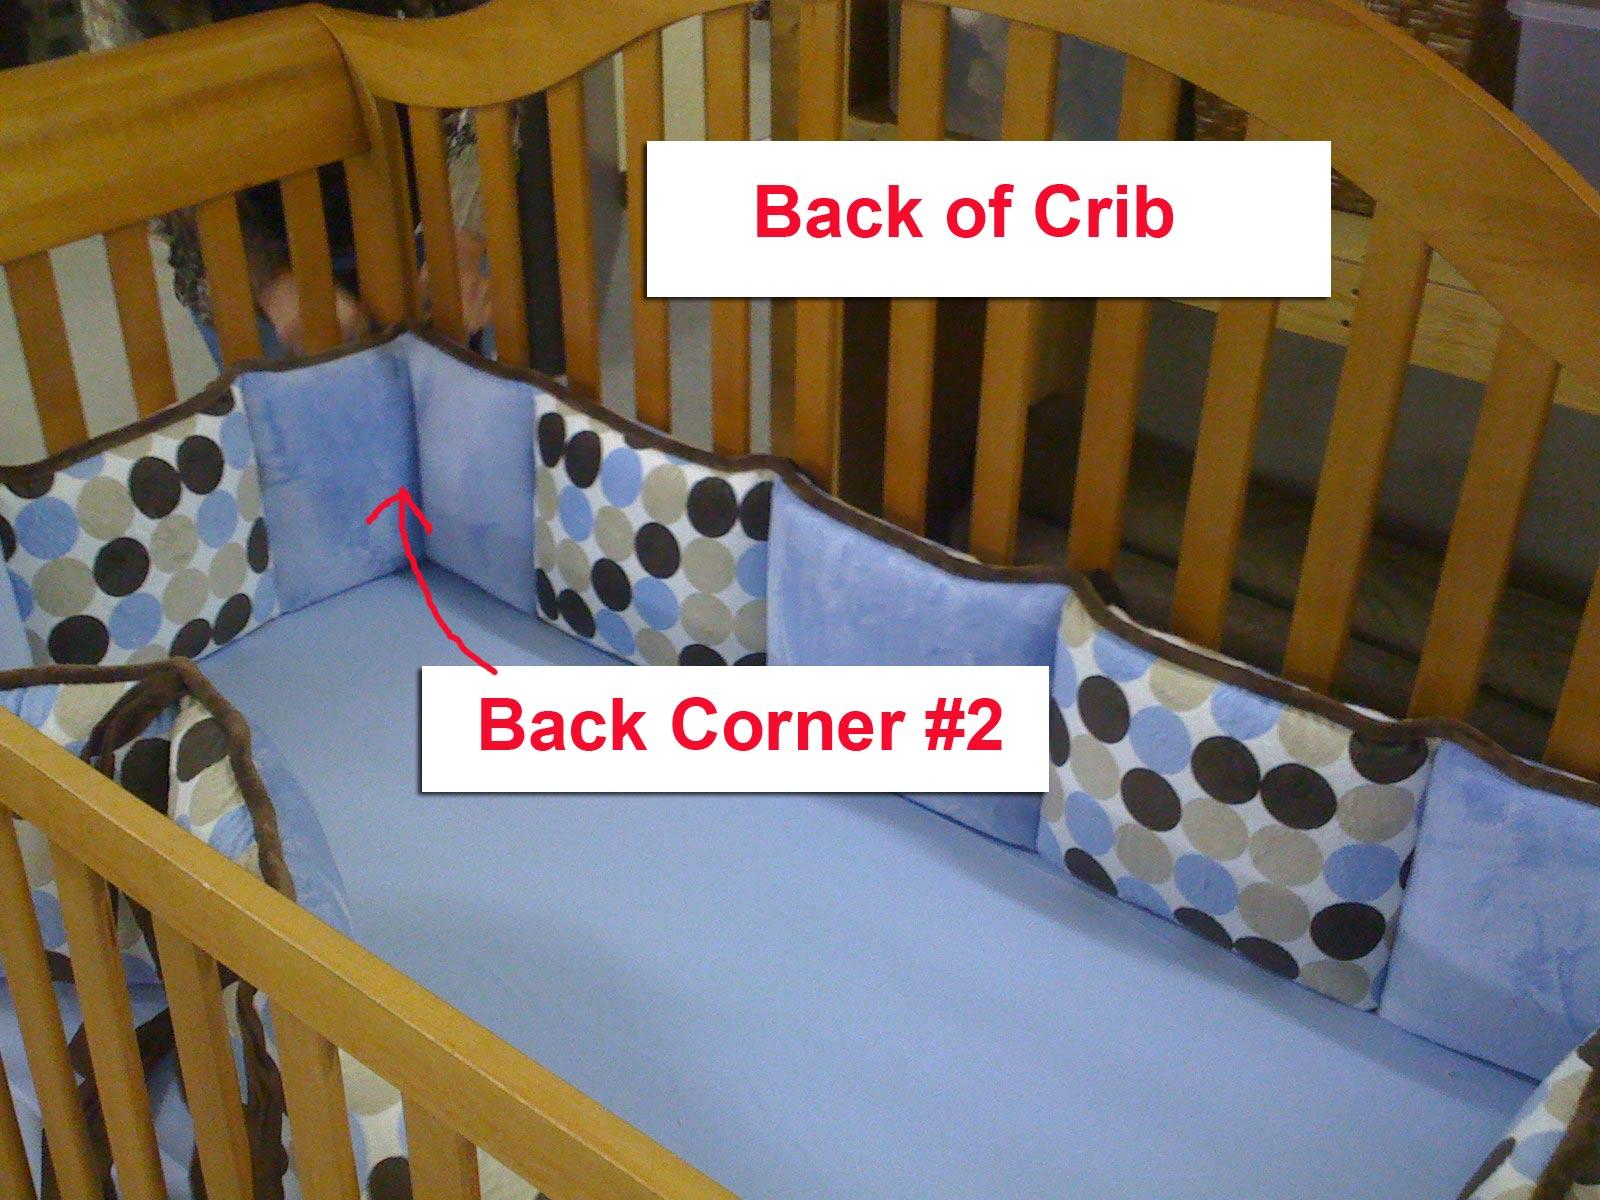 Stokke Crib Bumper | Mesh Crib Liner | Crib Bumpers